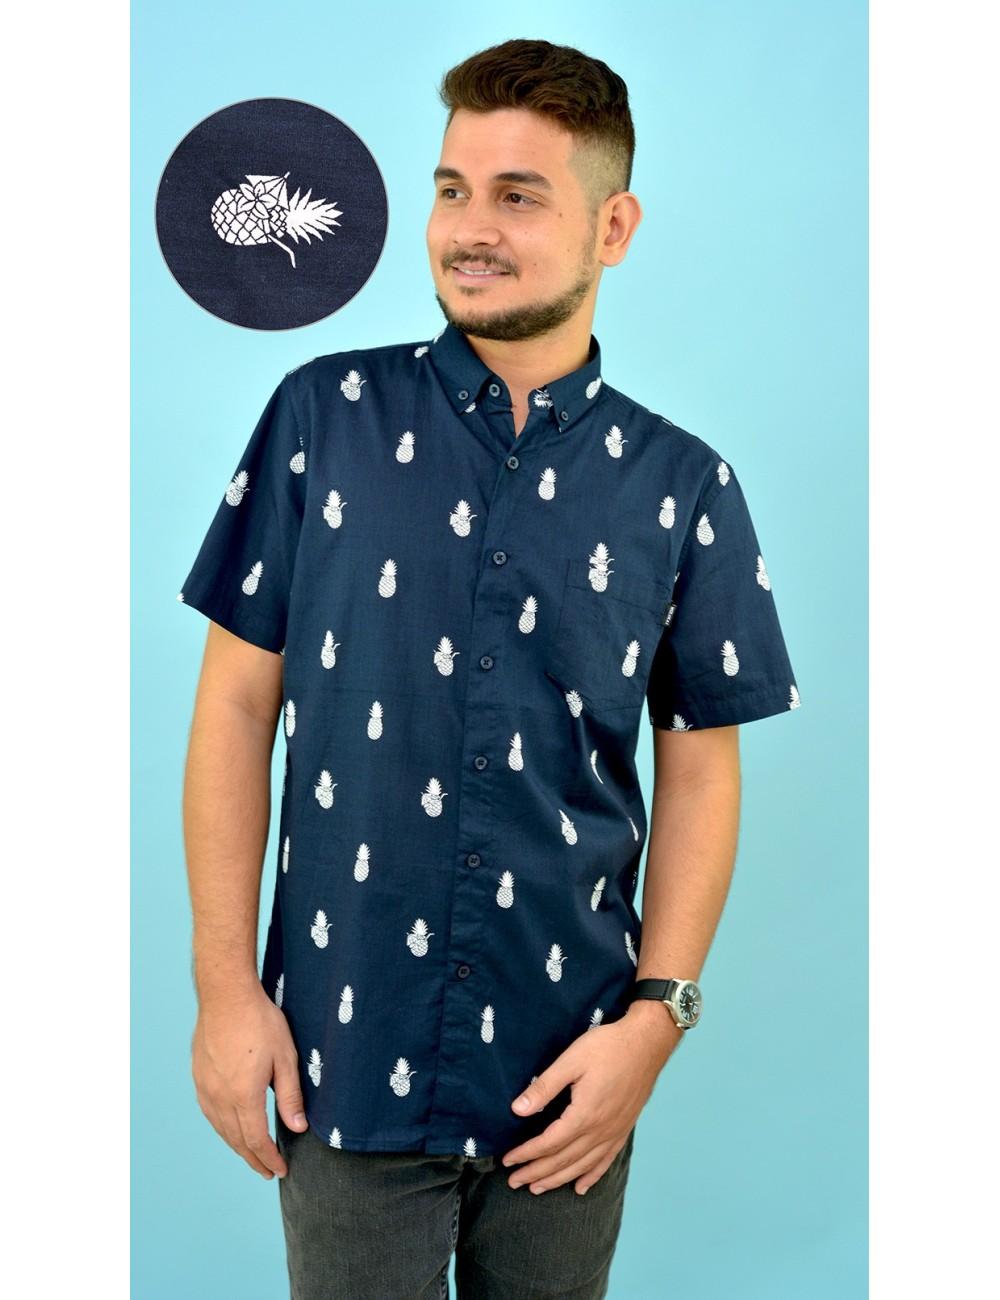 Camisa azul estampado pinas blancas